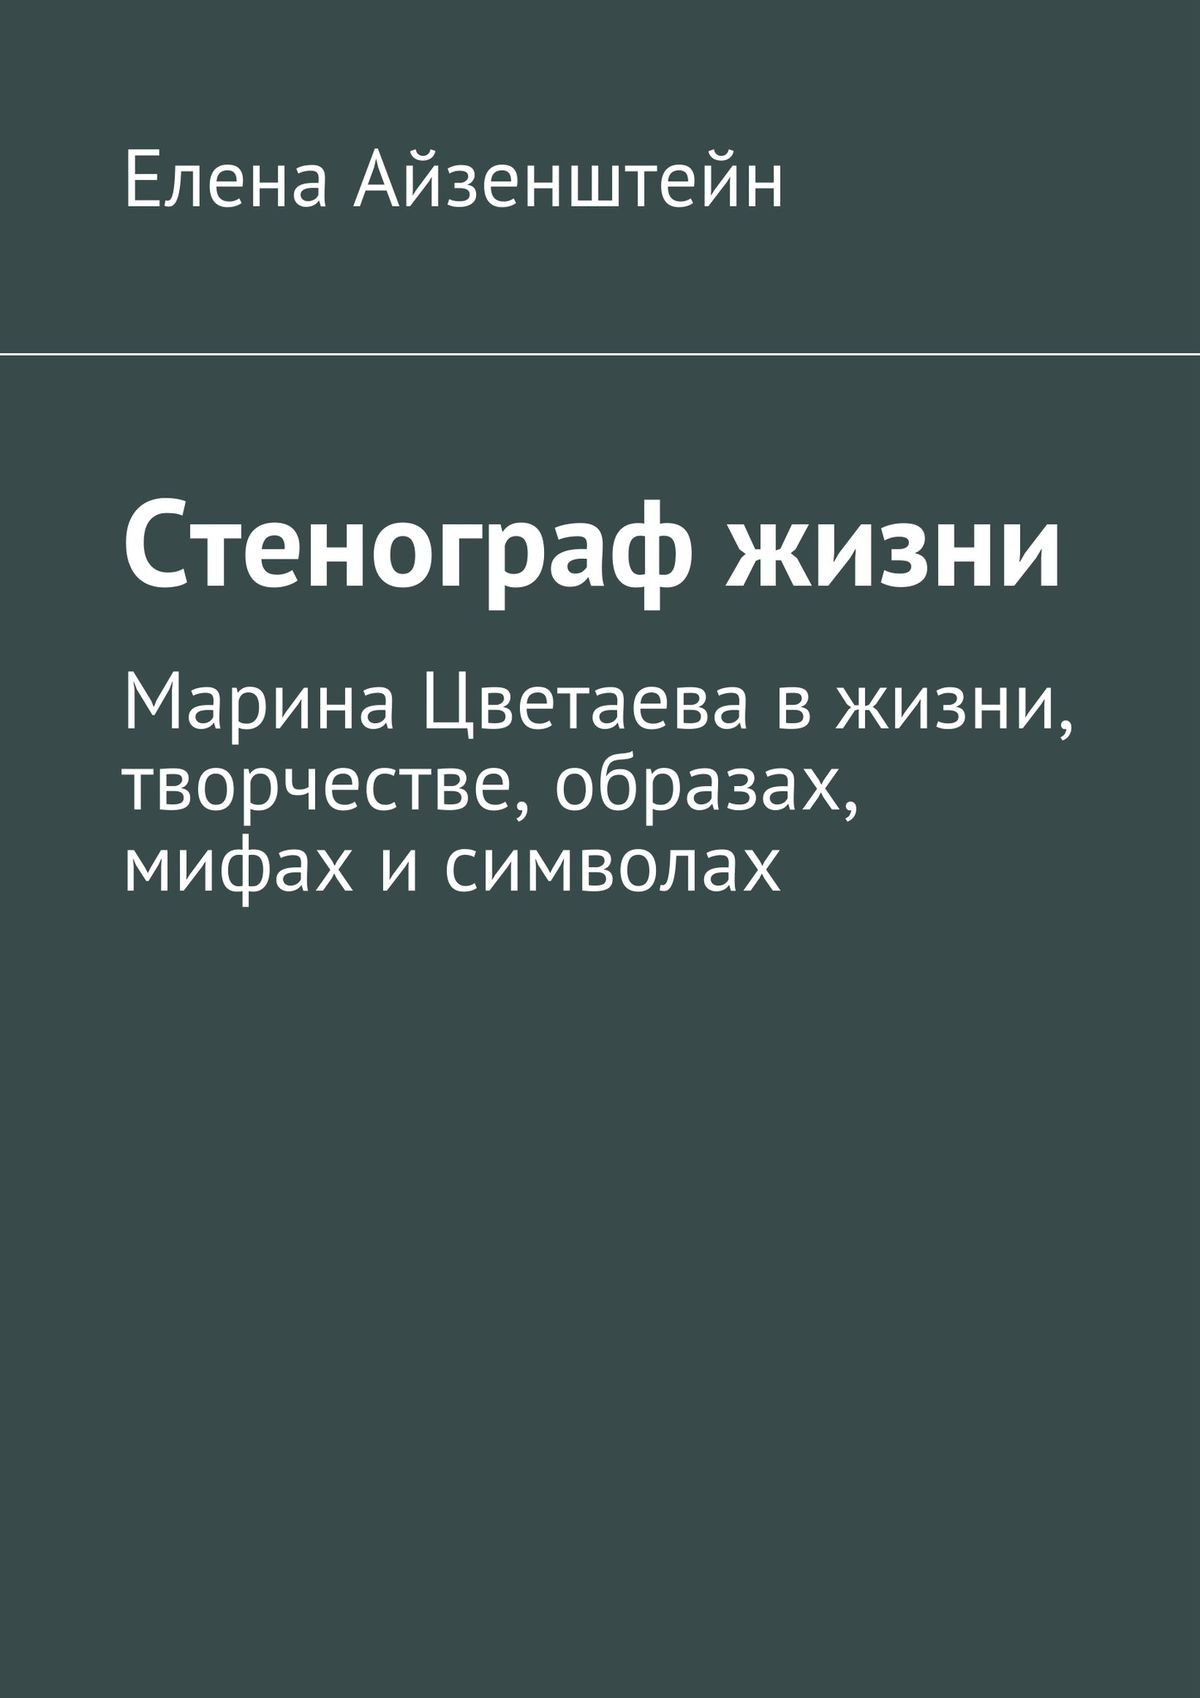 Елена Айзенштейн Стенограф жизни